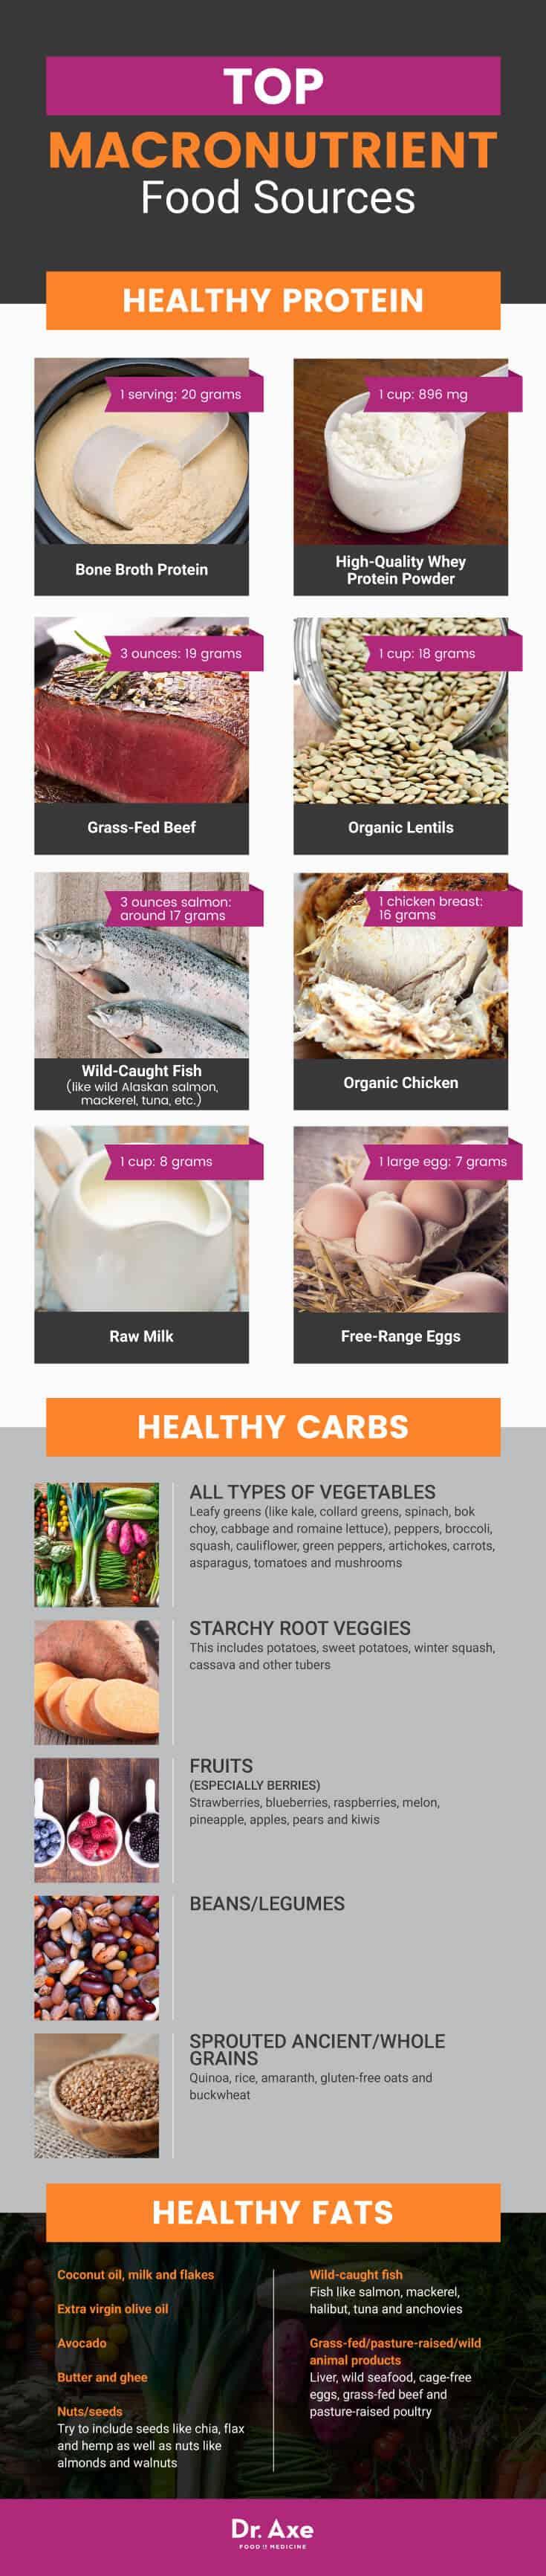 Top macronutrient food sources - Dr. Axe